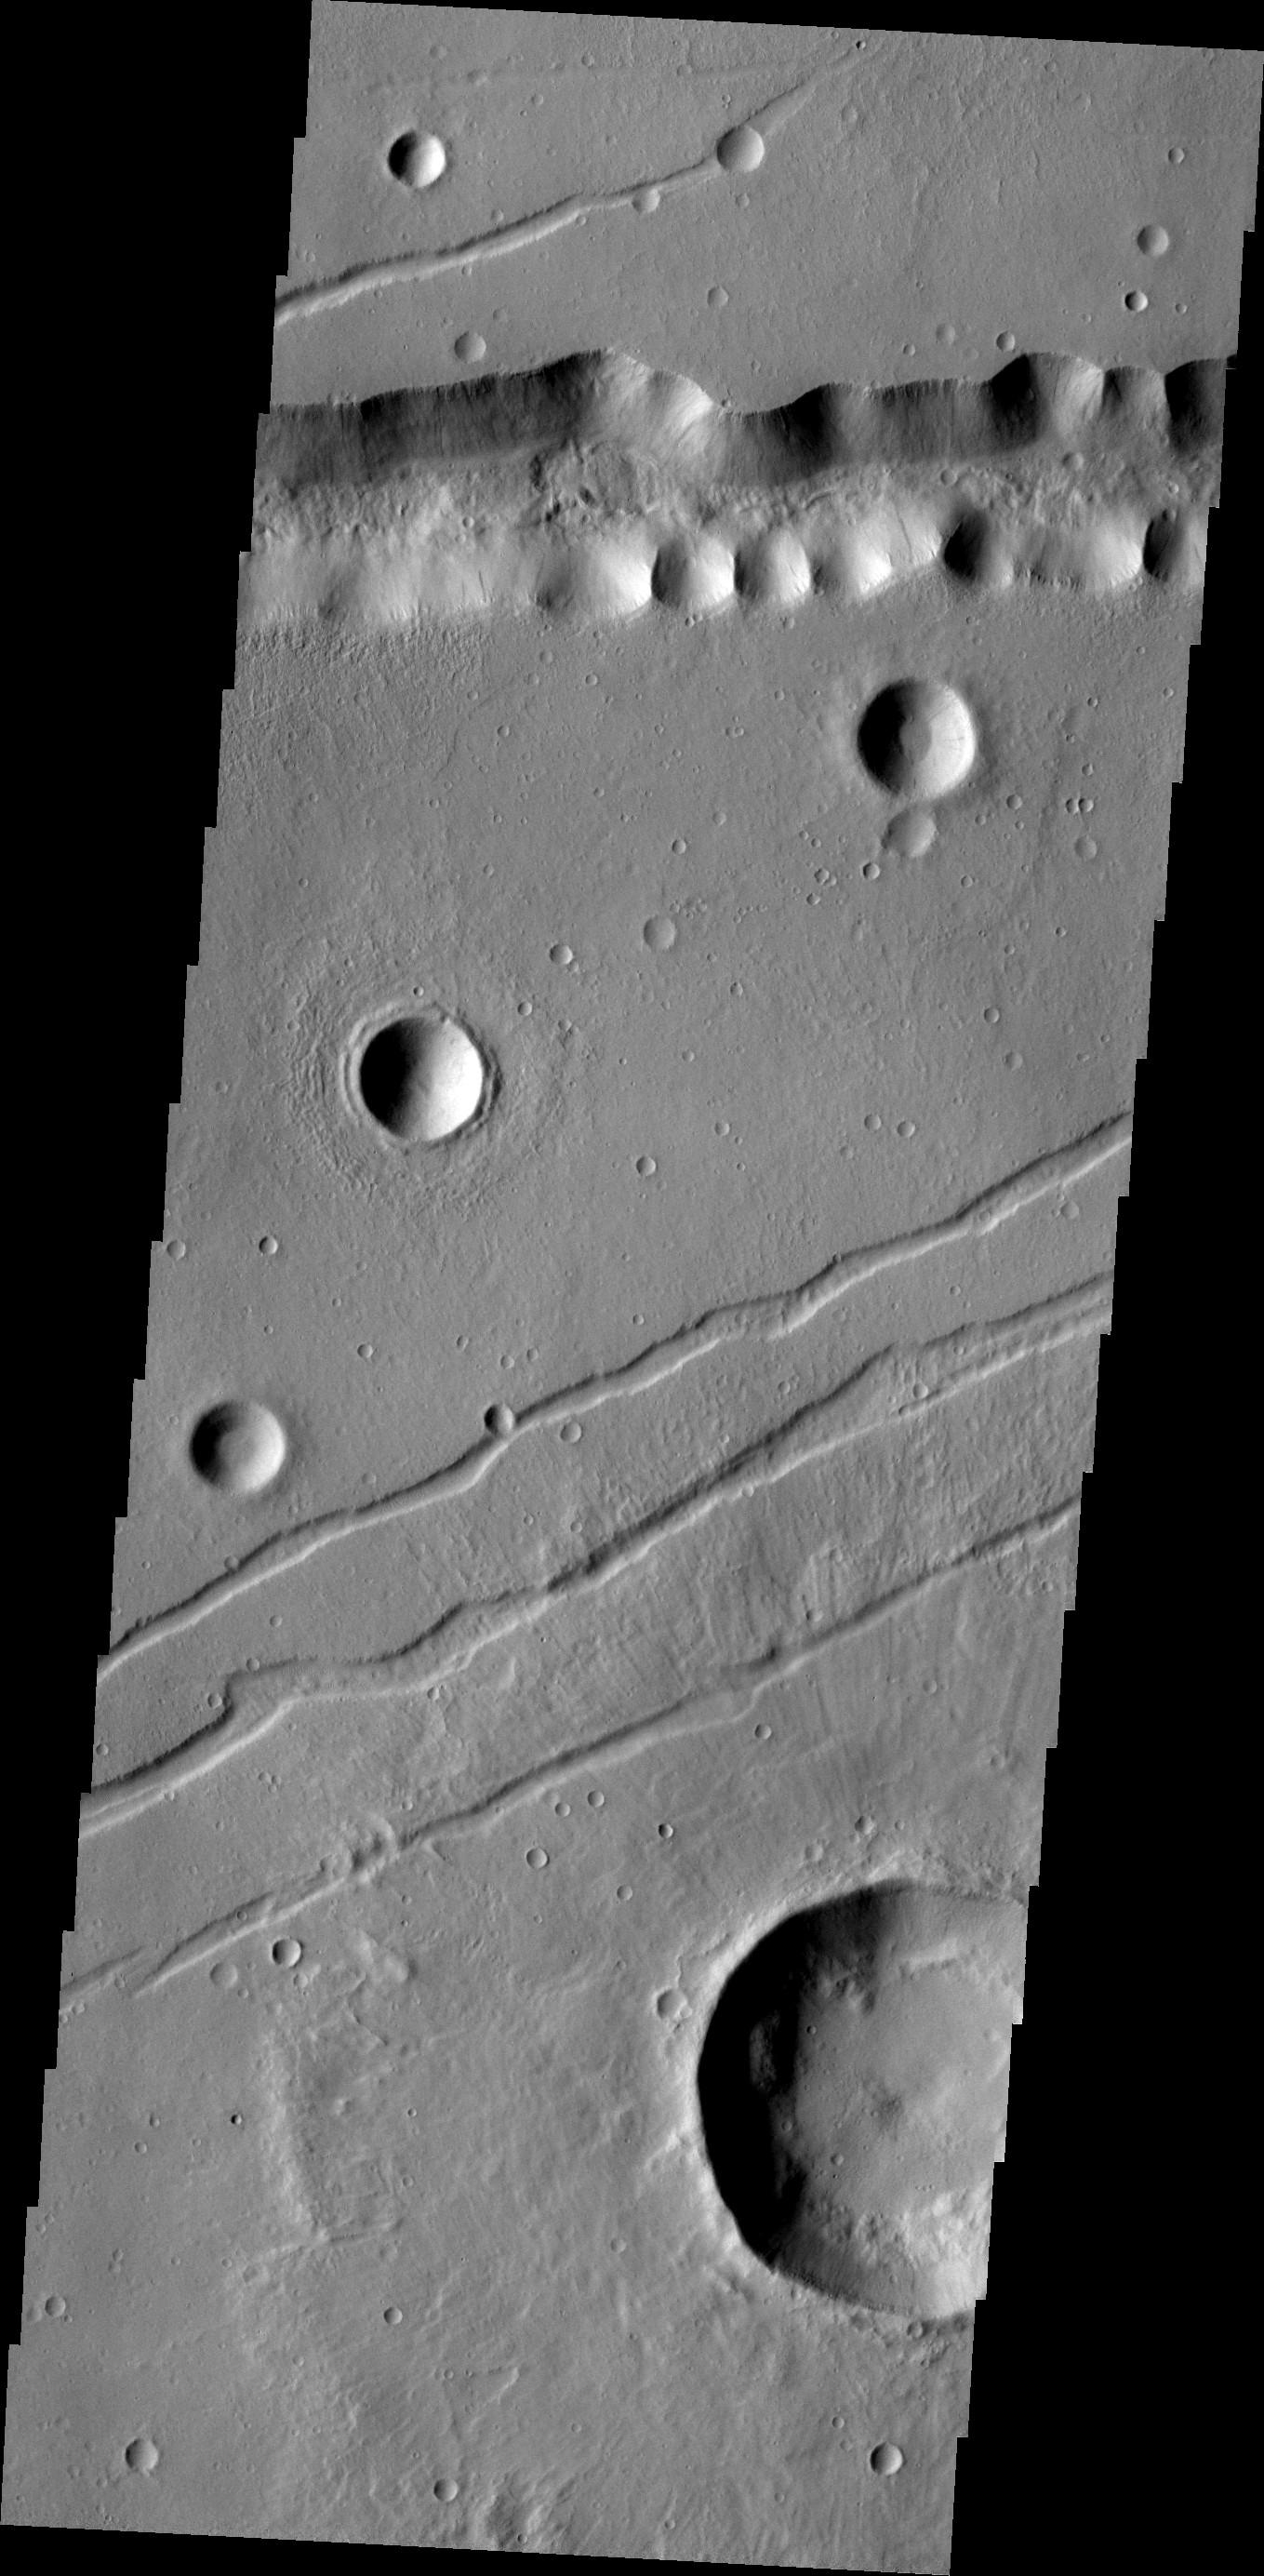 Labeatis Fossae | Mars Odyssey Mission THEMIS